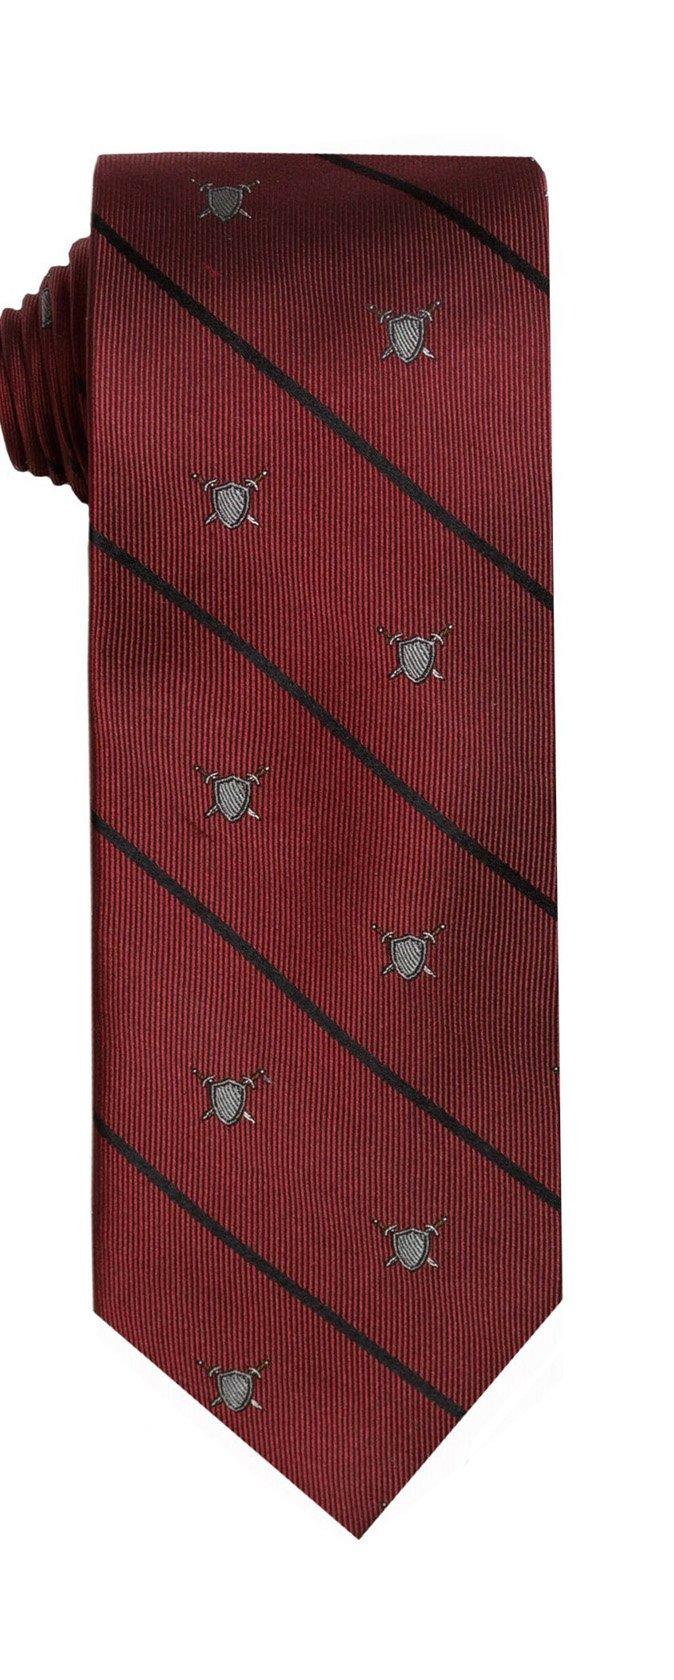 SPREZZA Men's Red Coat of Arms Conversational Tie Classic 2.75 inch Slim Silk Cotton Necktie